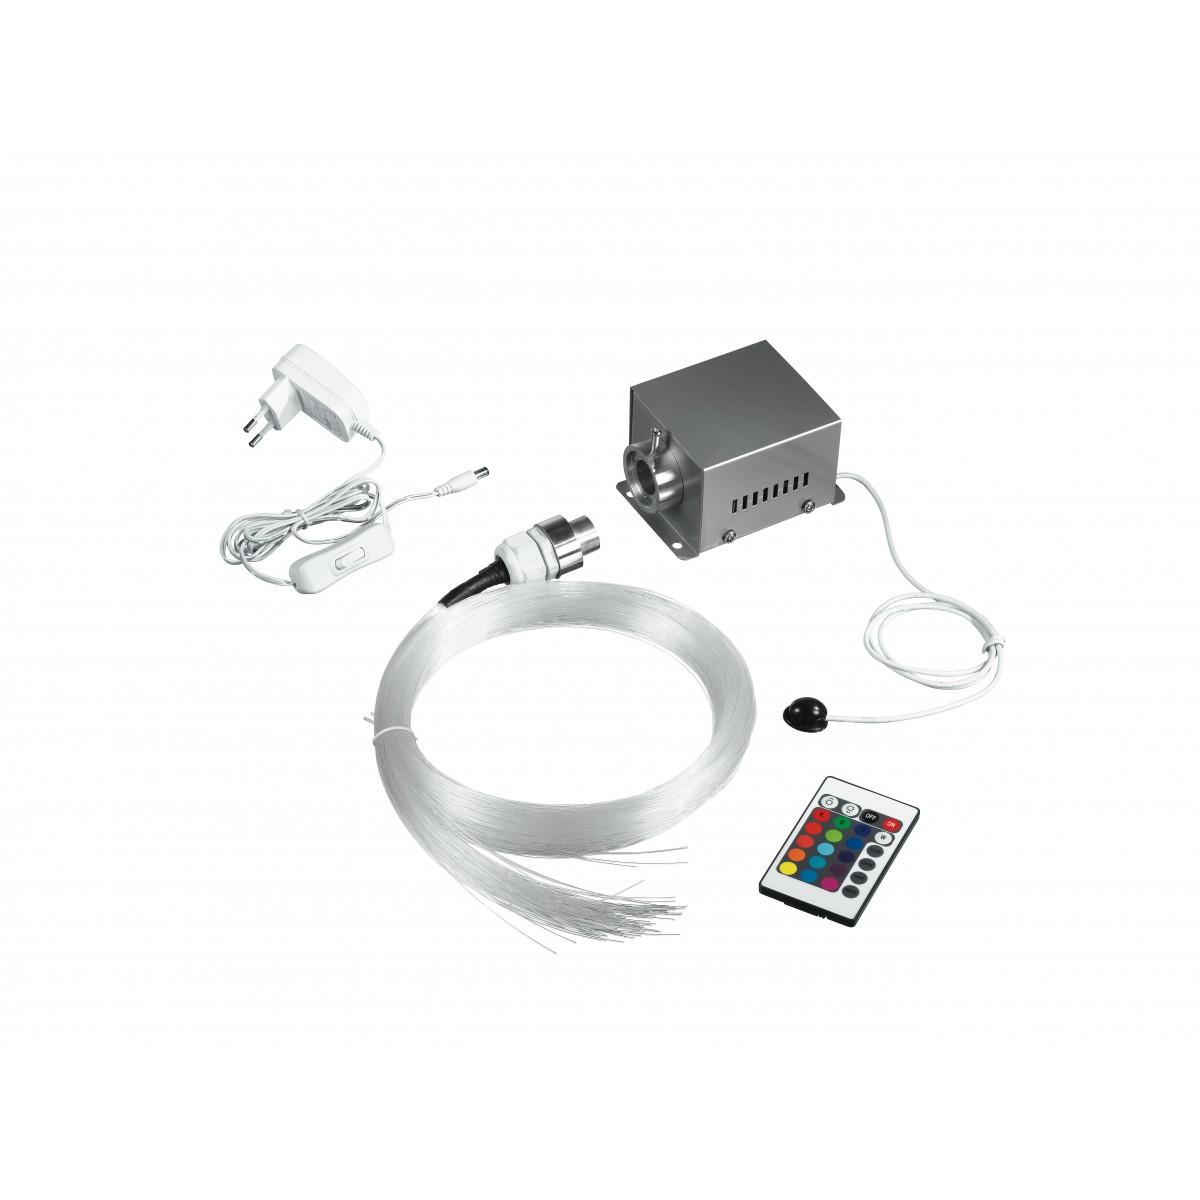 FIBRAOTTICA-LED-RGB - Kit Fibraottica con Telecomando Controller Led 9 watt RGB